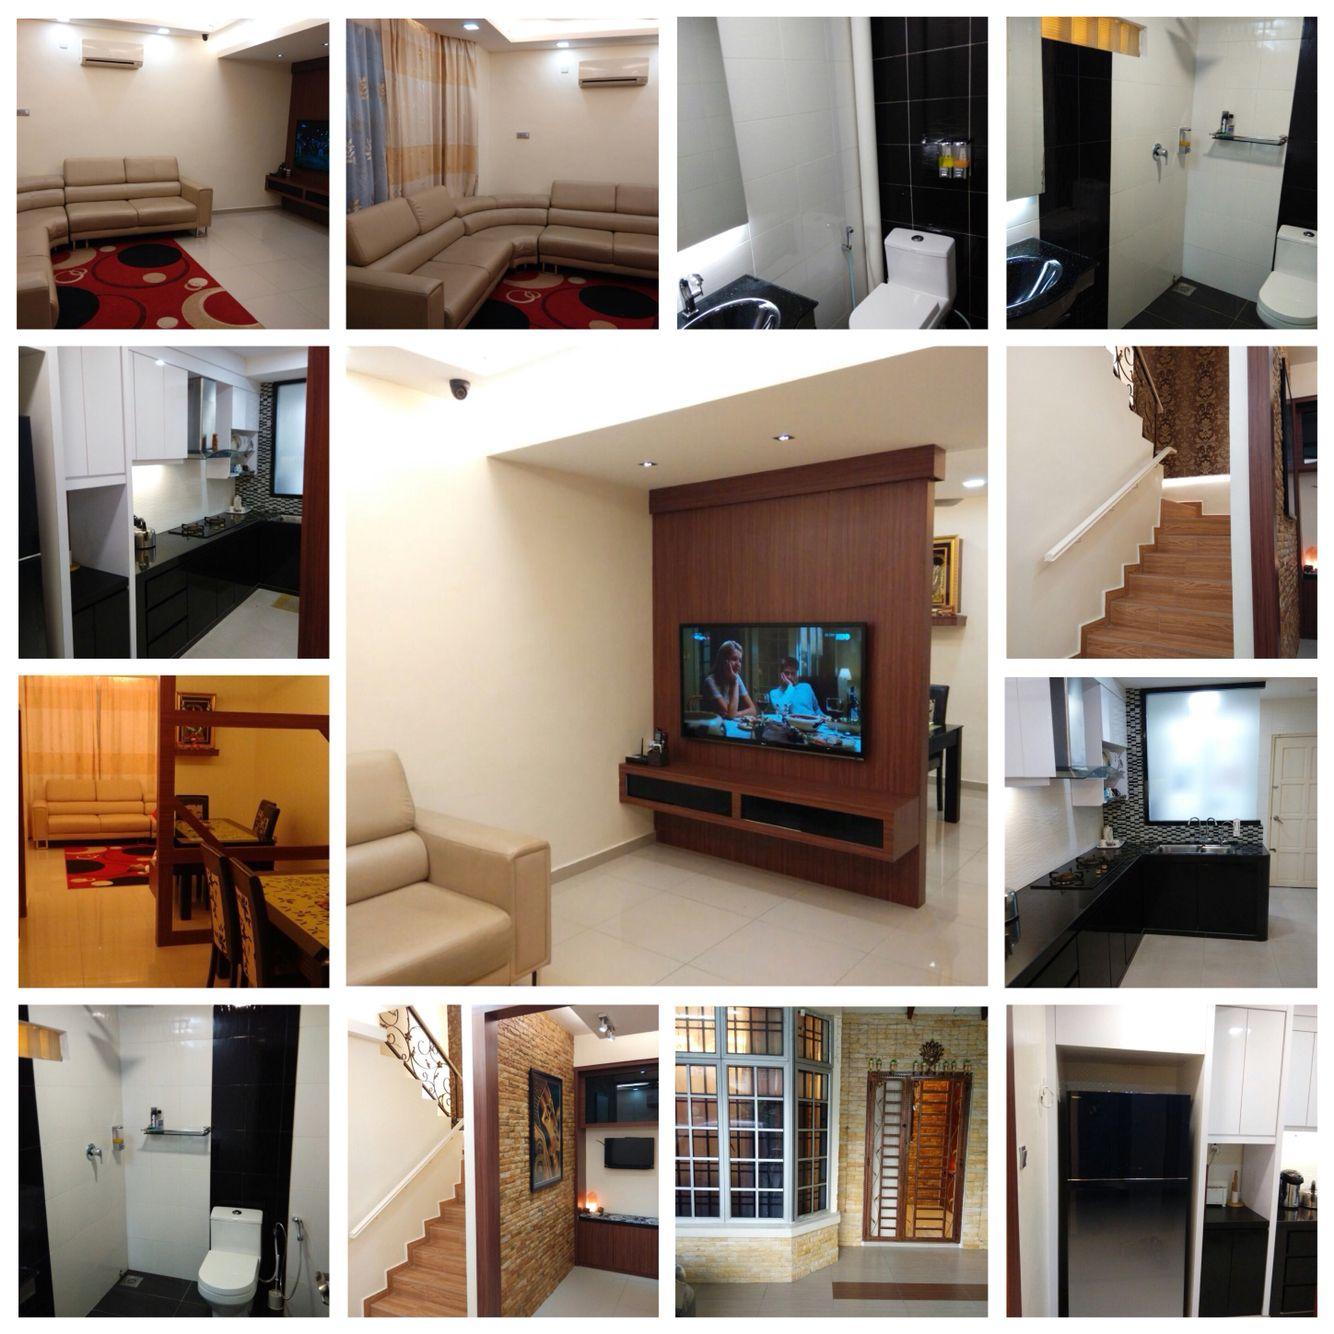 Tmn Scientex Pasir Gudang Dsth 20 70 5 Rooms 1 Store Room 1540 Sqft Fully Renovated Interior Design In Modern Conc Living Hall Bathroom Renos Interior Design